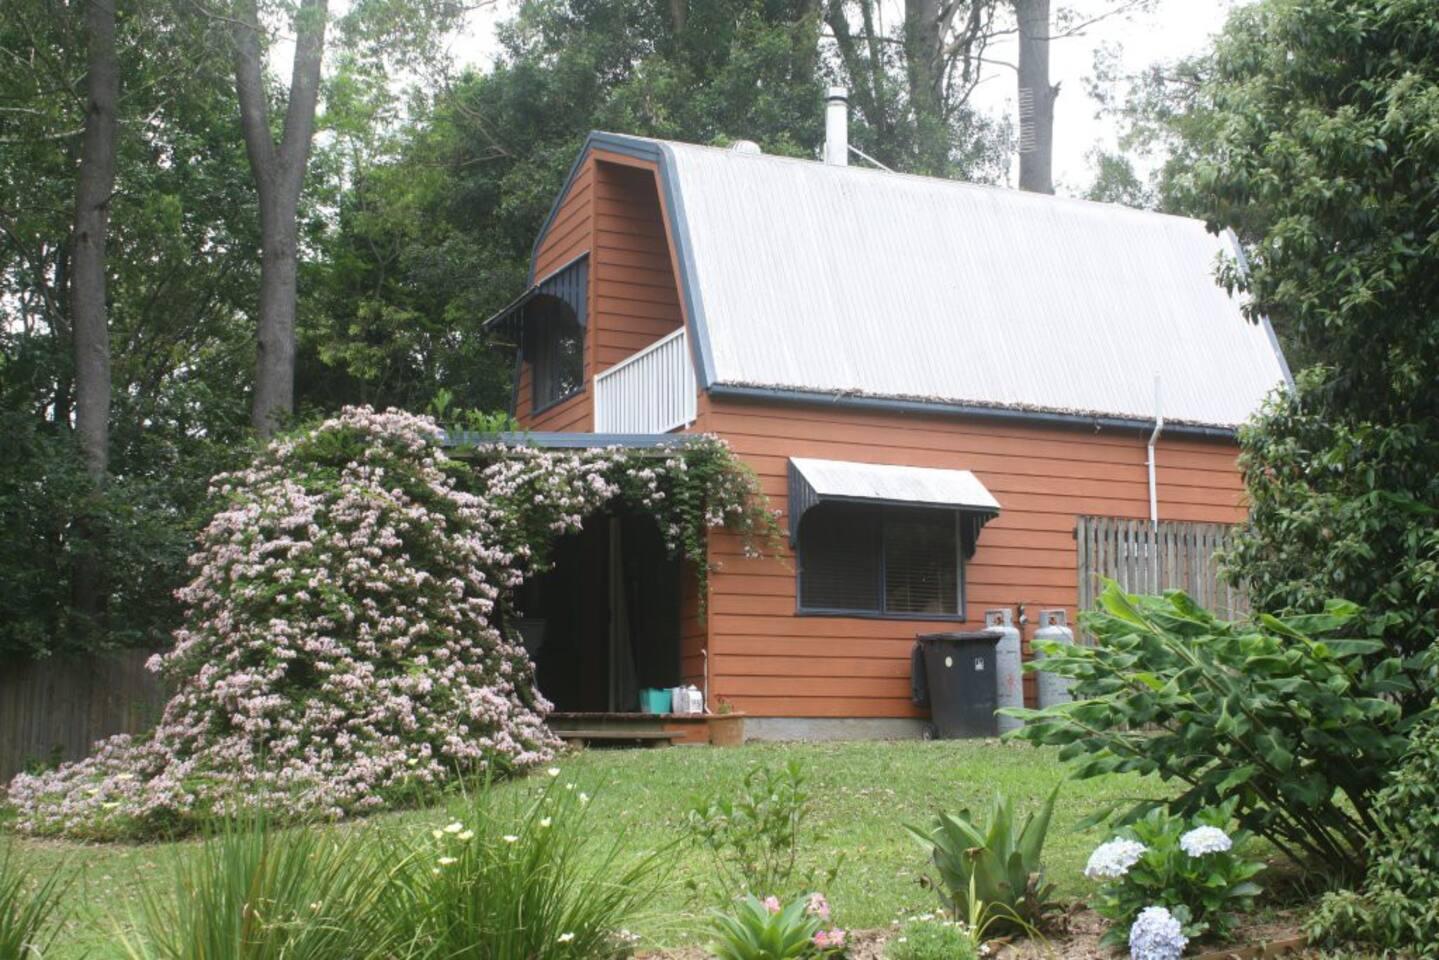 The vine covered veranda